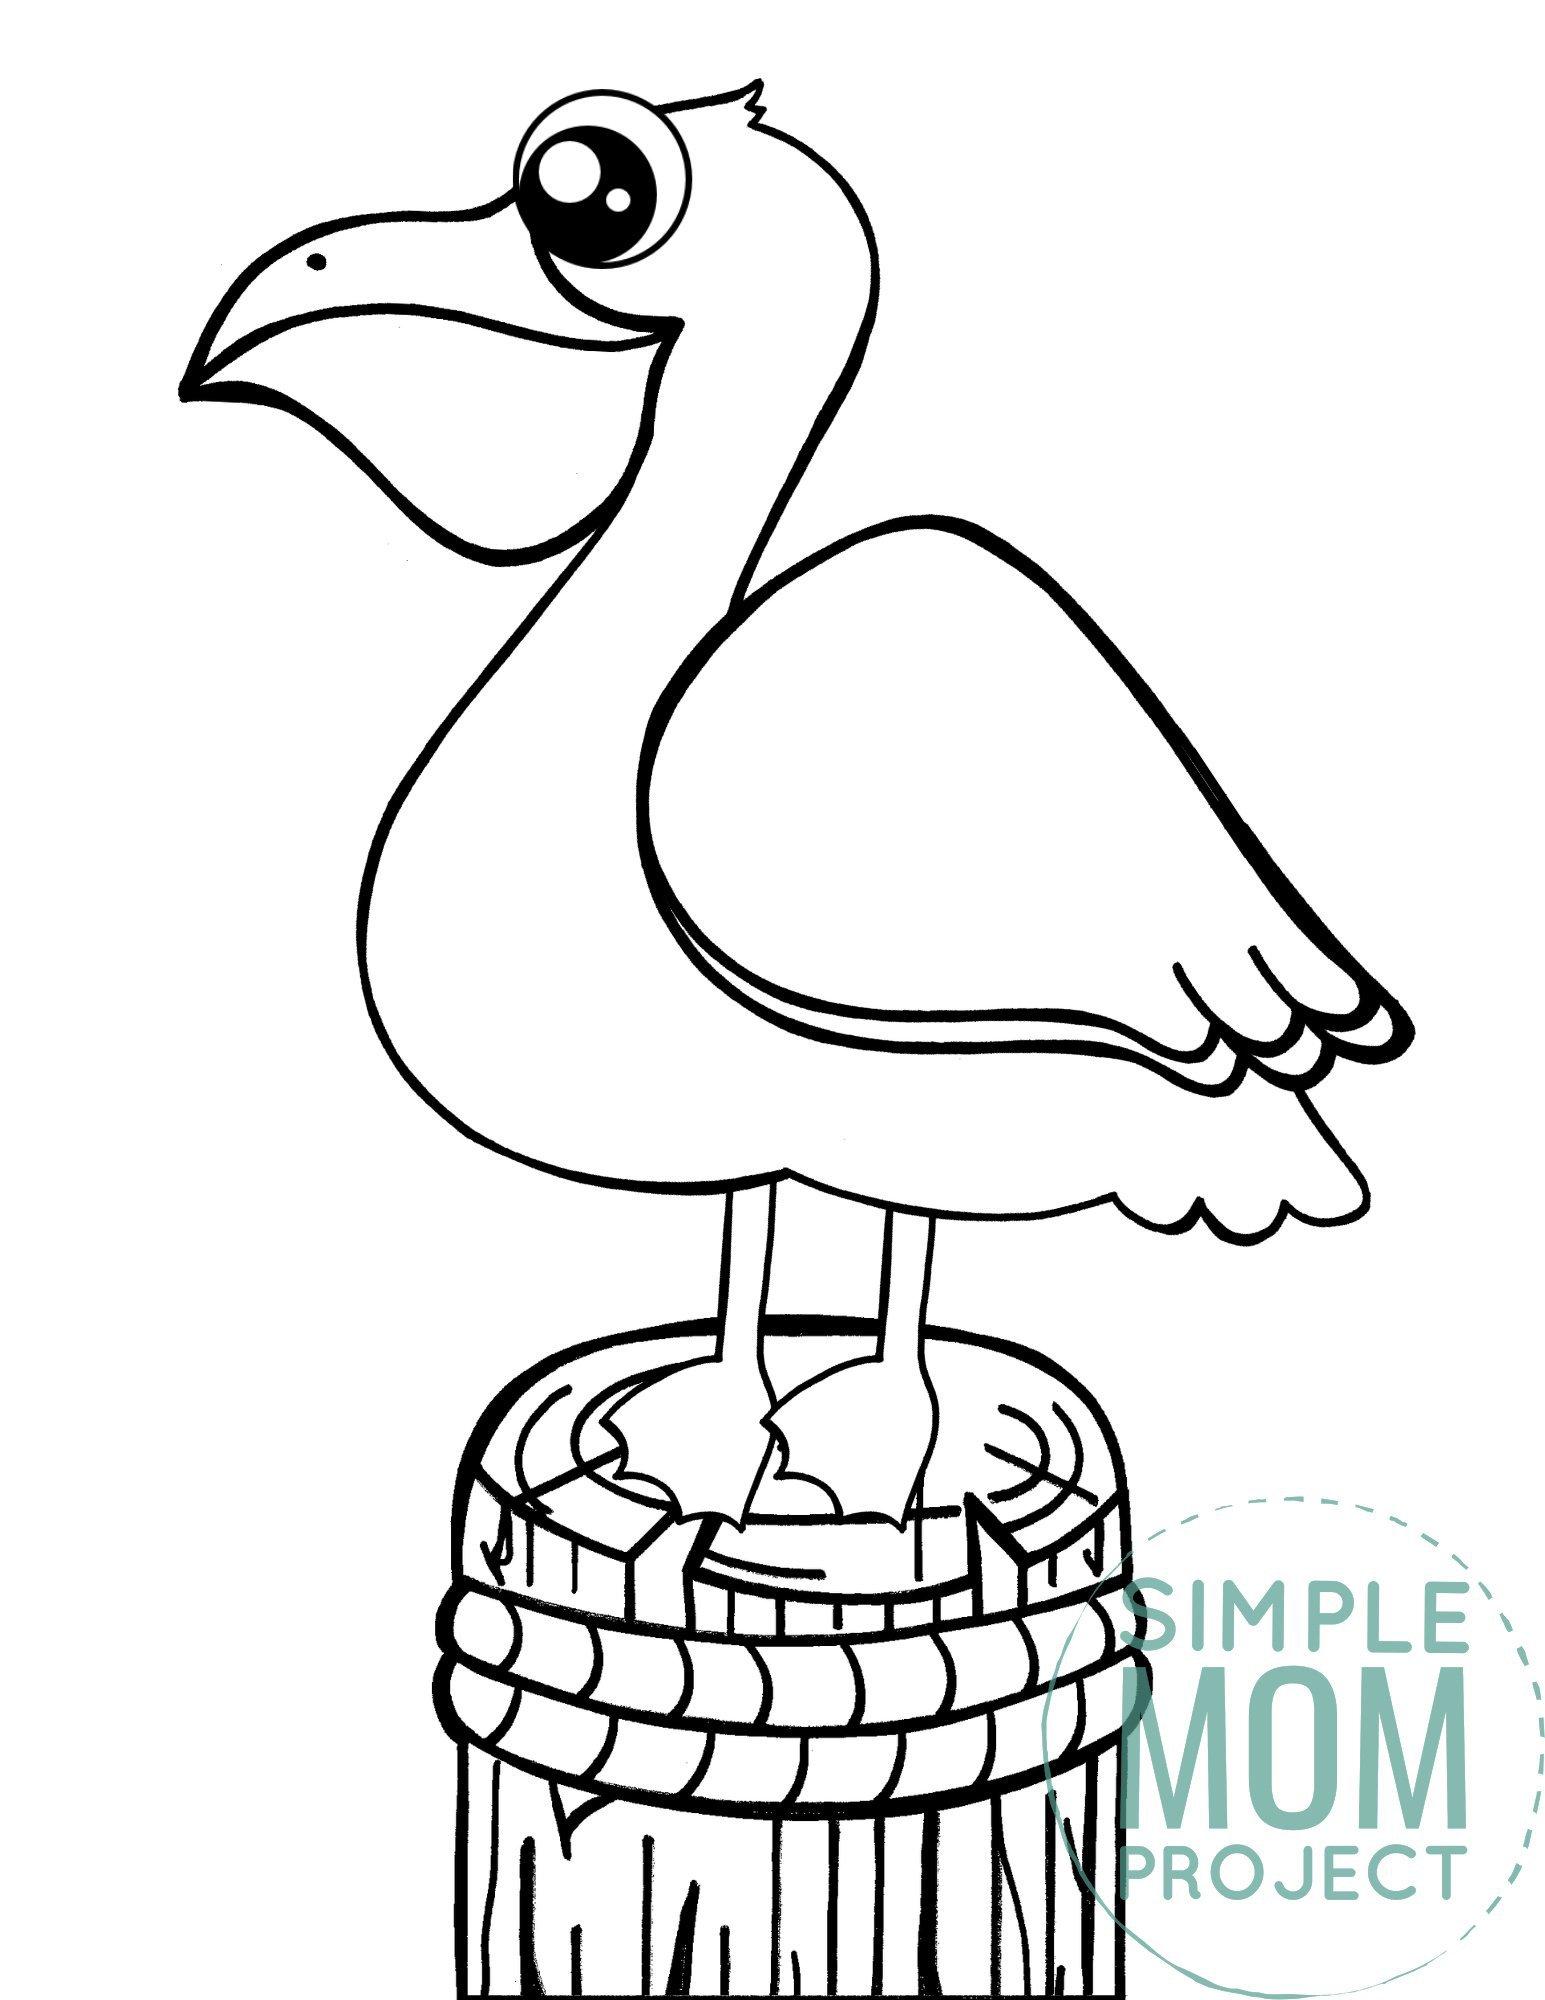 Printable Pelican Ocean Animal Coloring Page for Kids